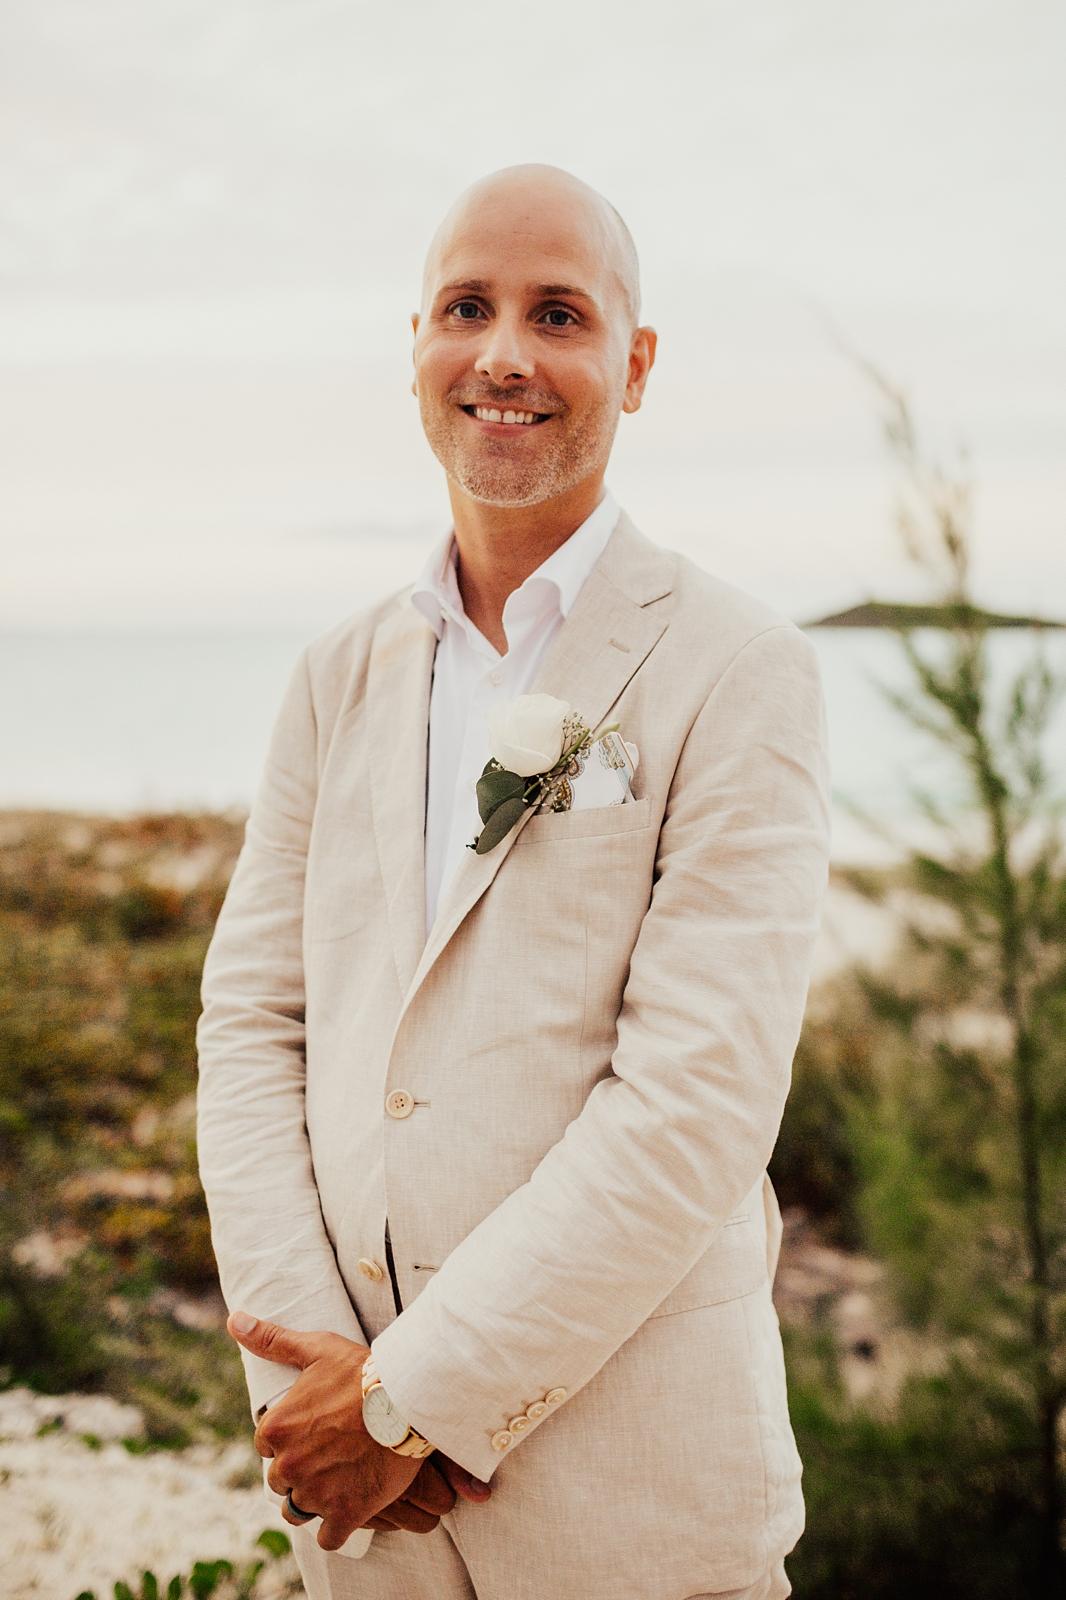 Jenni & Andrew Intimate Beach Destination Wedding in Little Exuma, Bahamas_0531.jpg